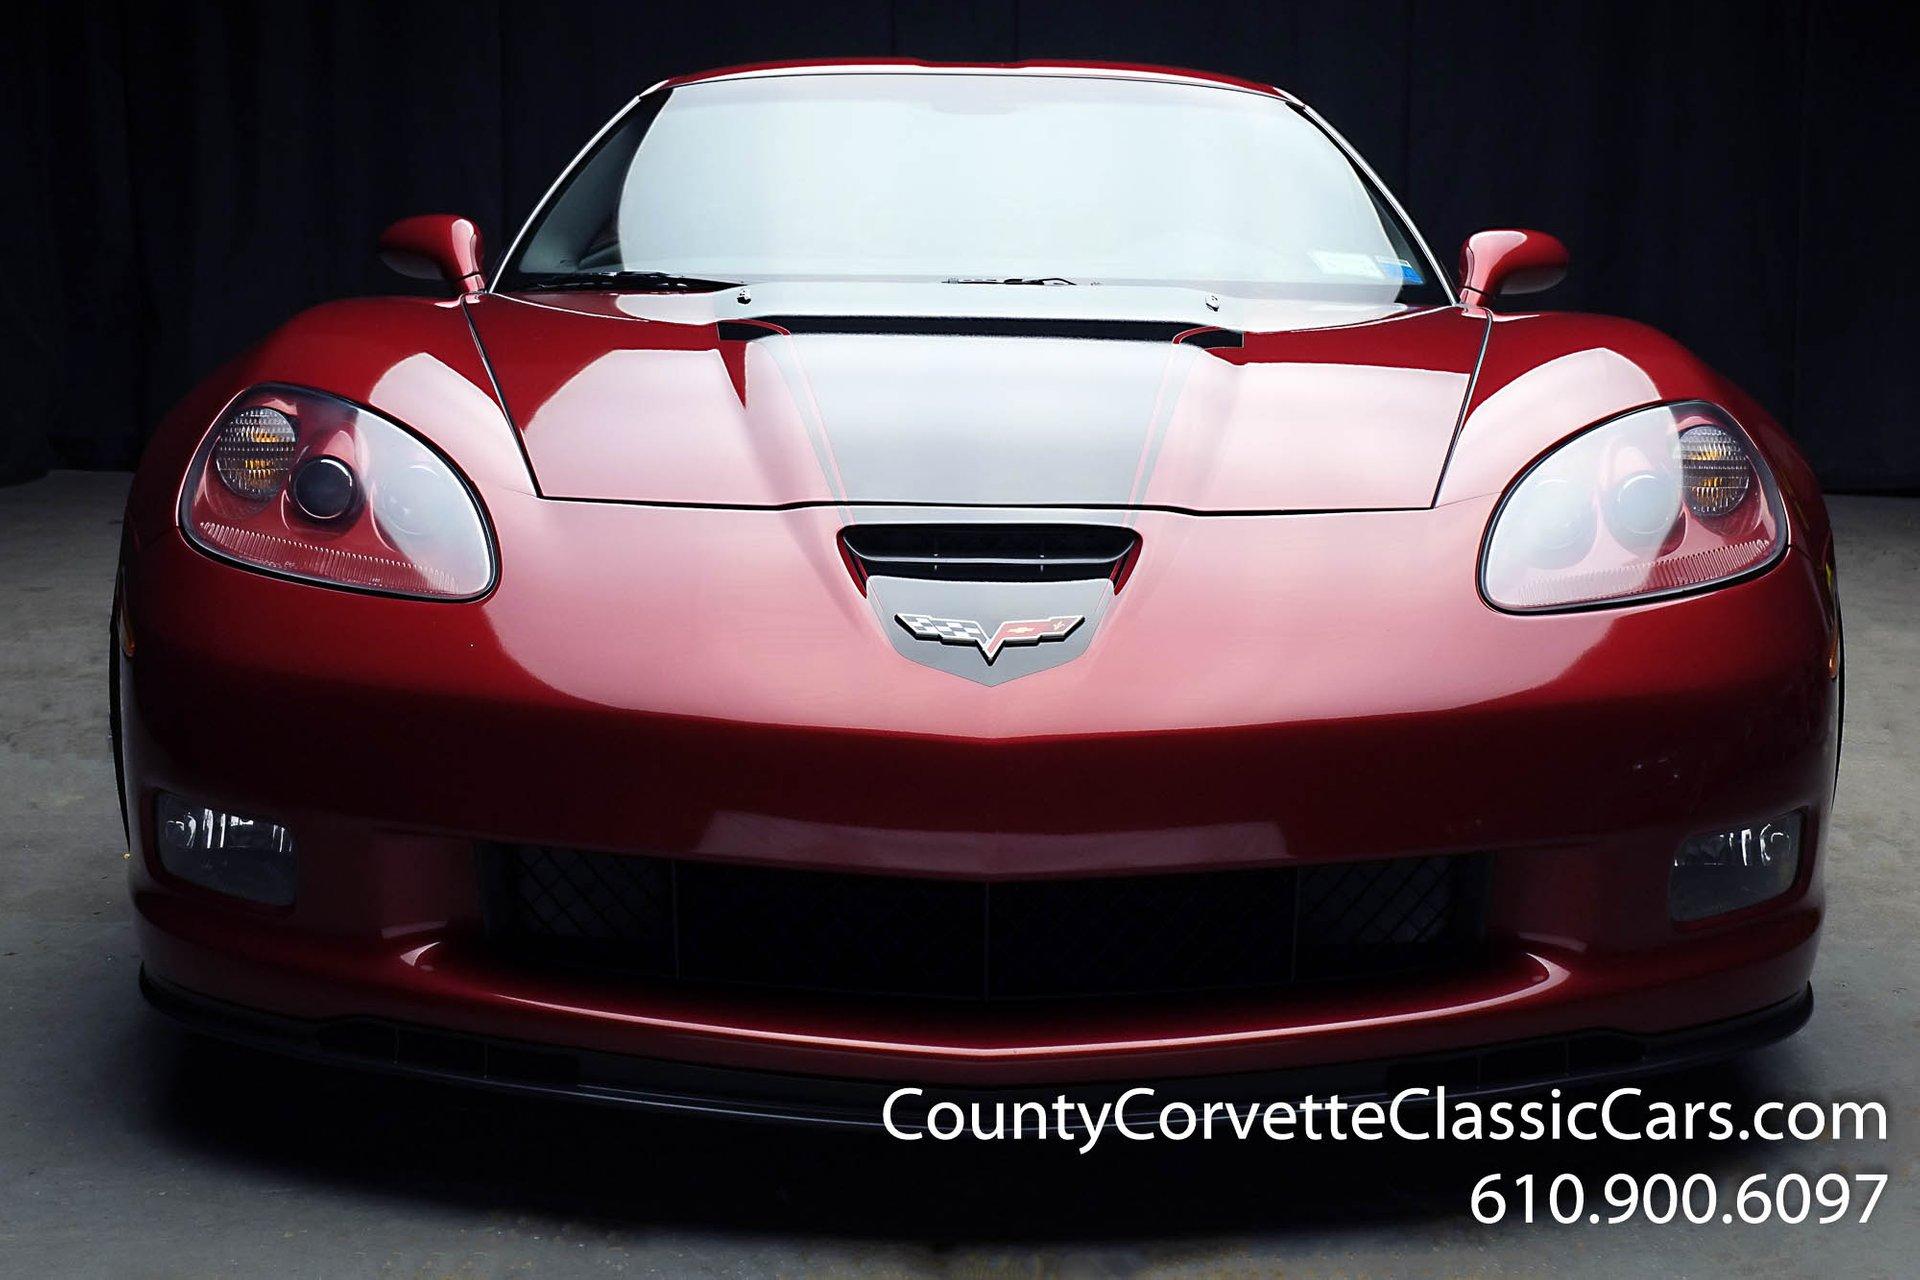 2008 chevrolet corvette z06 commemorative edition